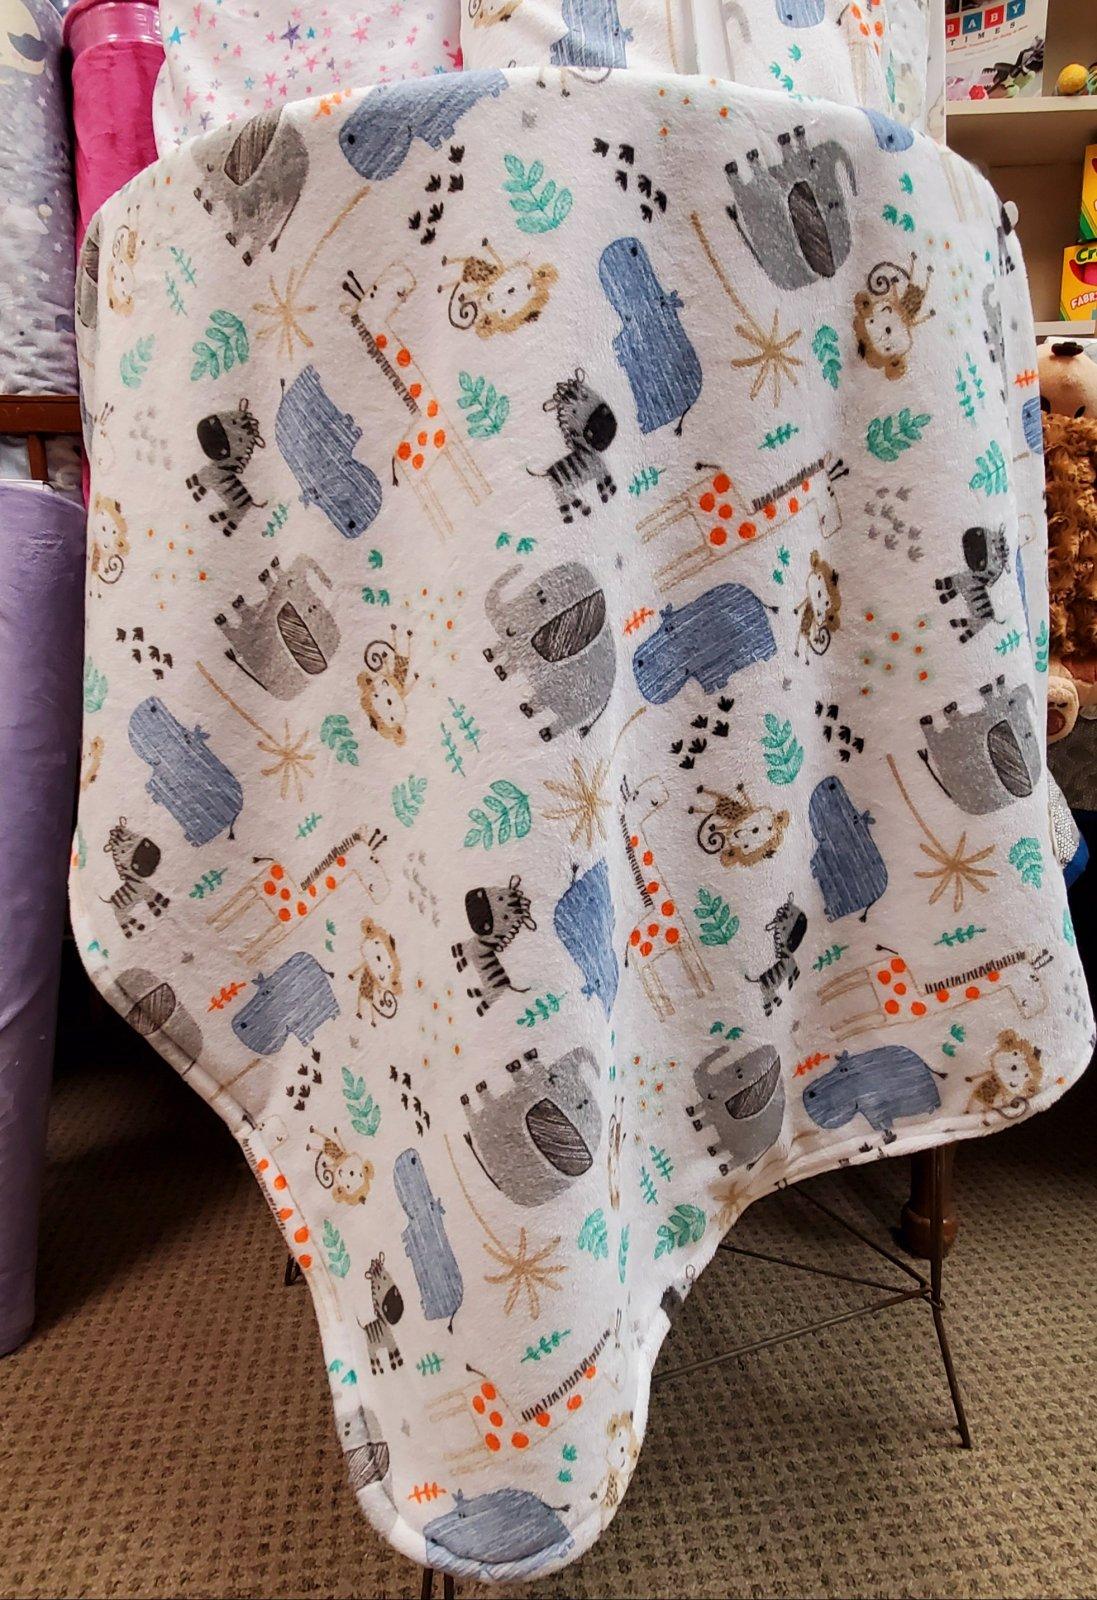 Cuddly Blanket Kit - Safari animals